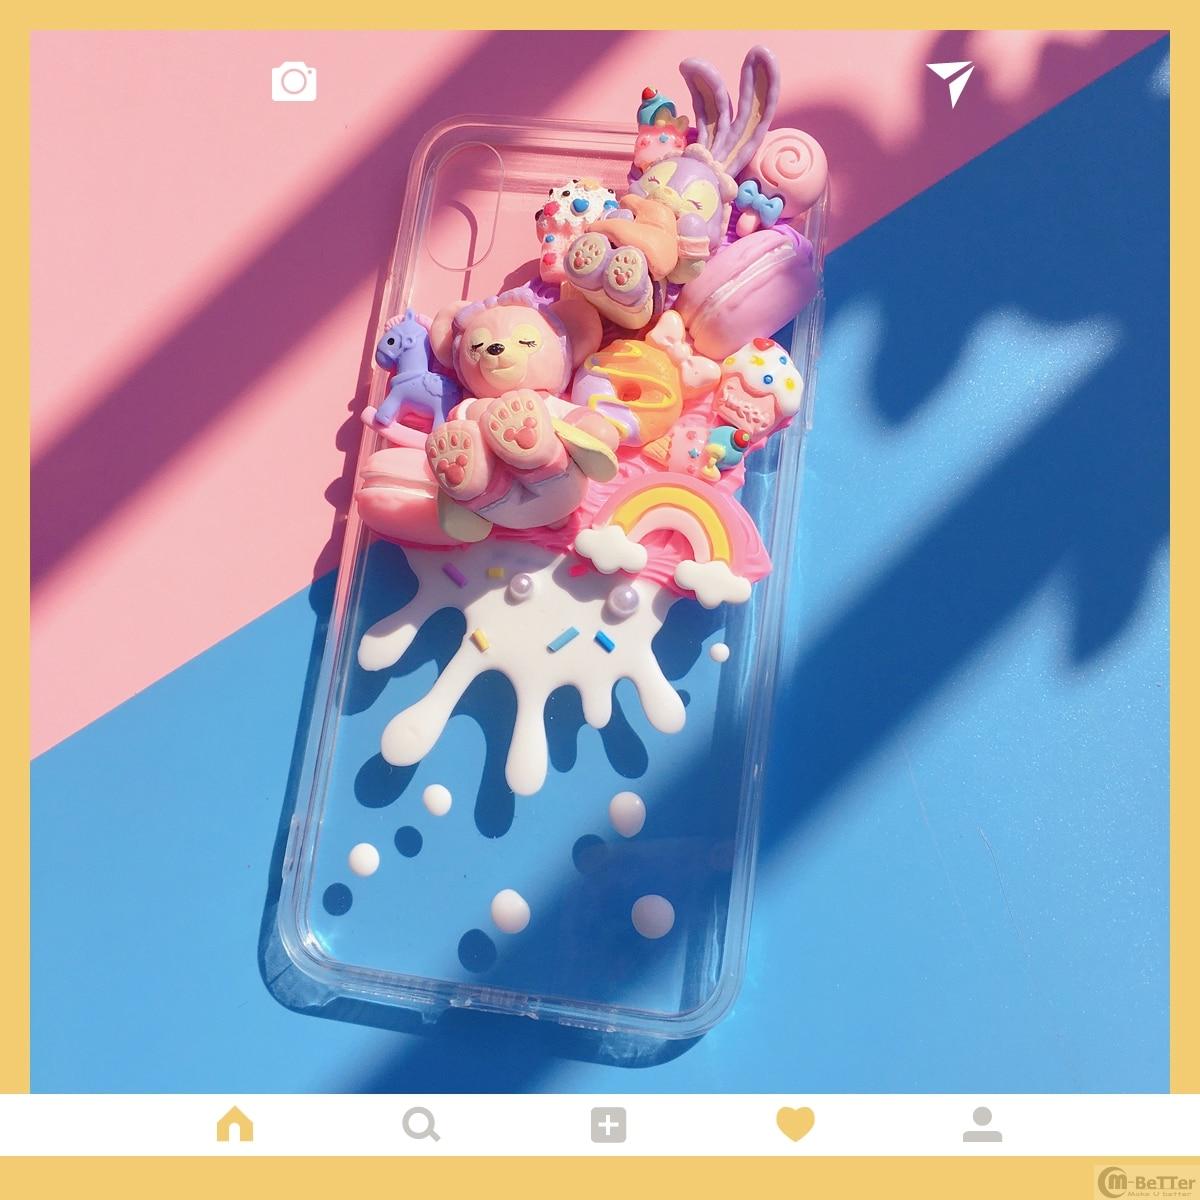 DIY case for Samsung s10plus 3D bear phone cover galaxy note10/9/8plus handmade pink creamy shell s8/9+ s7edge icecream bonut